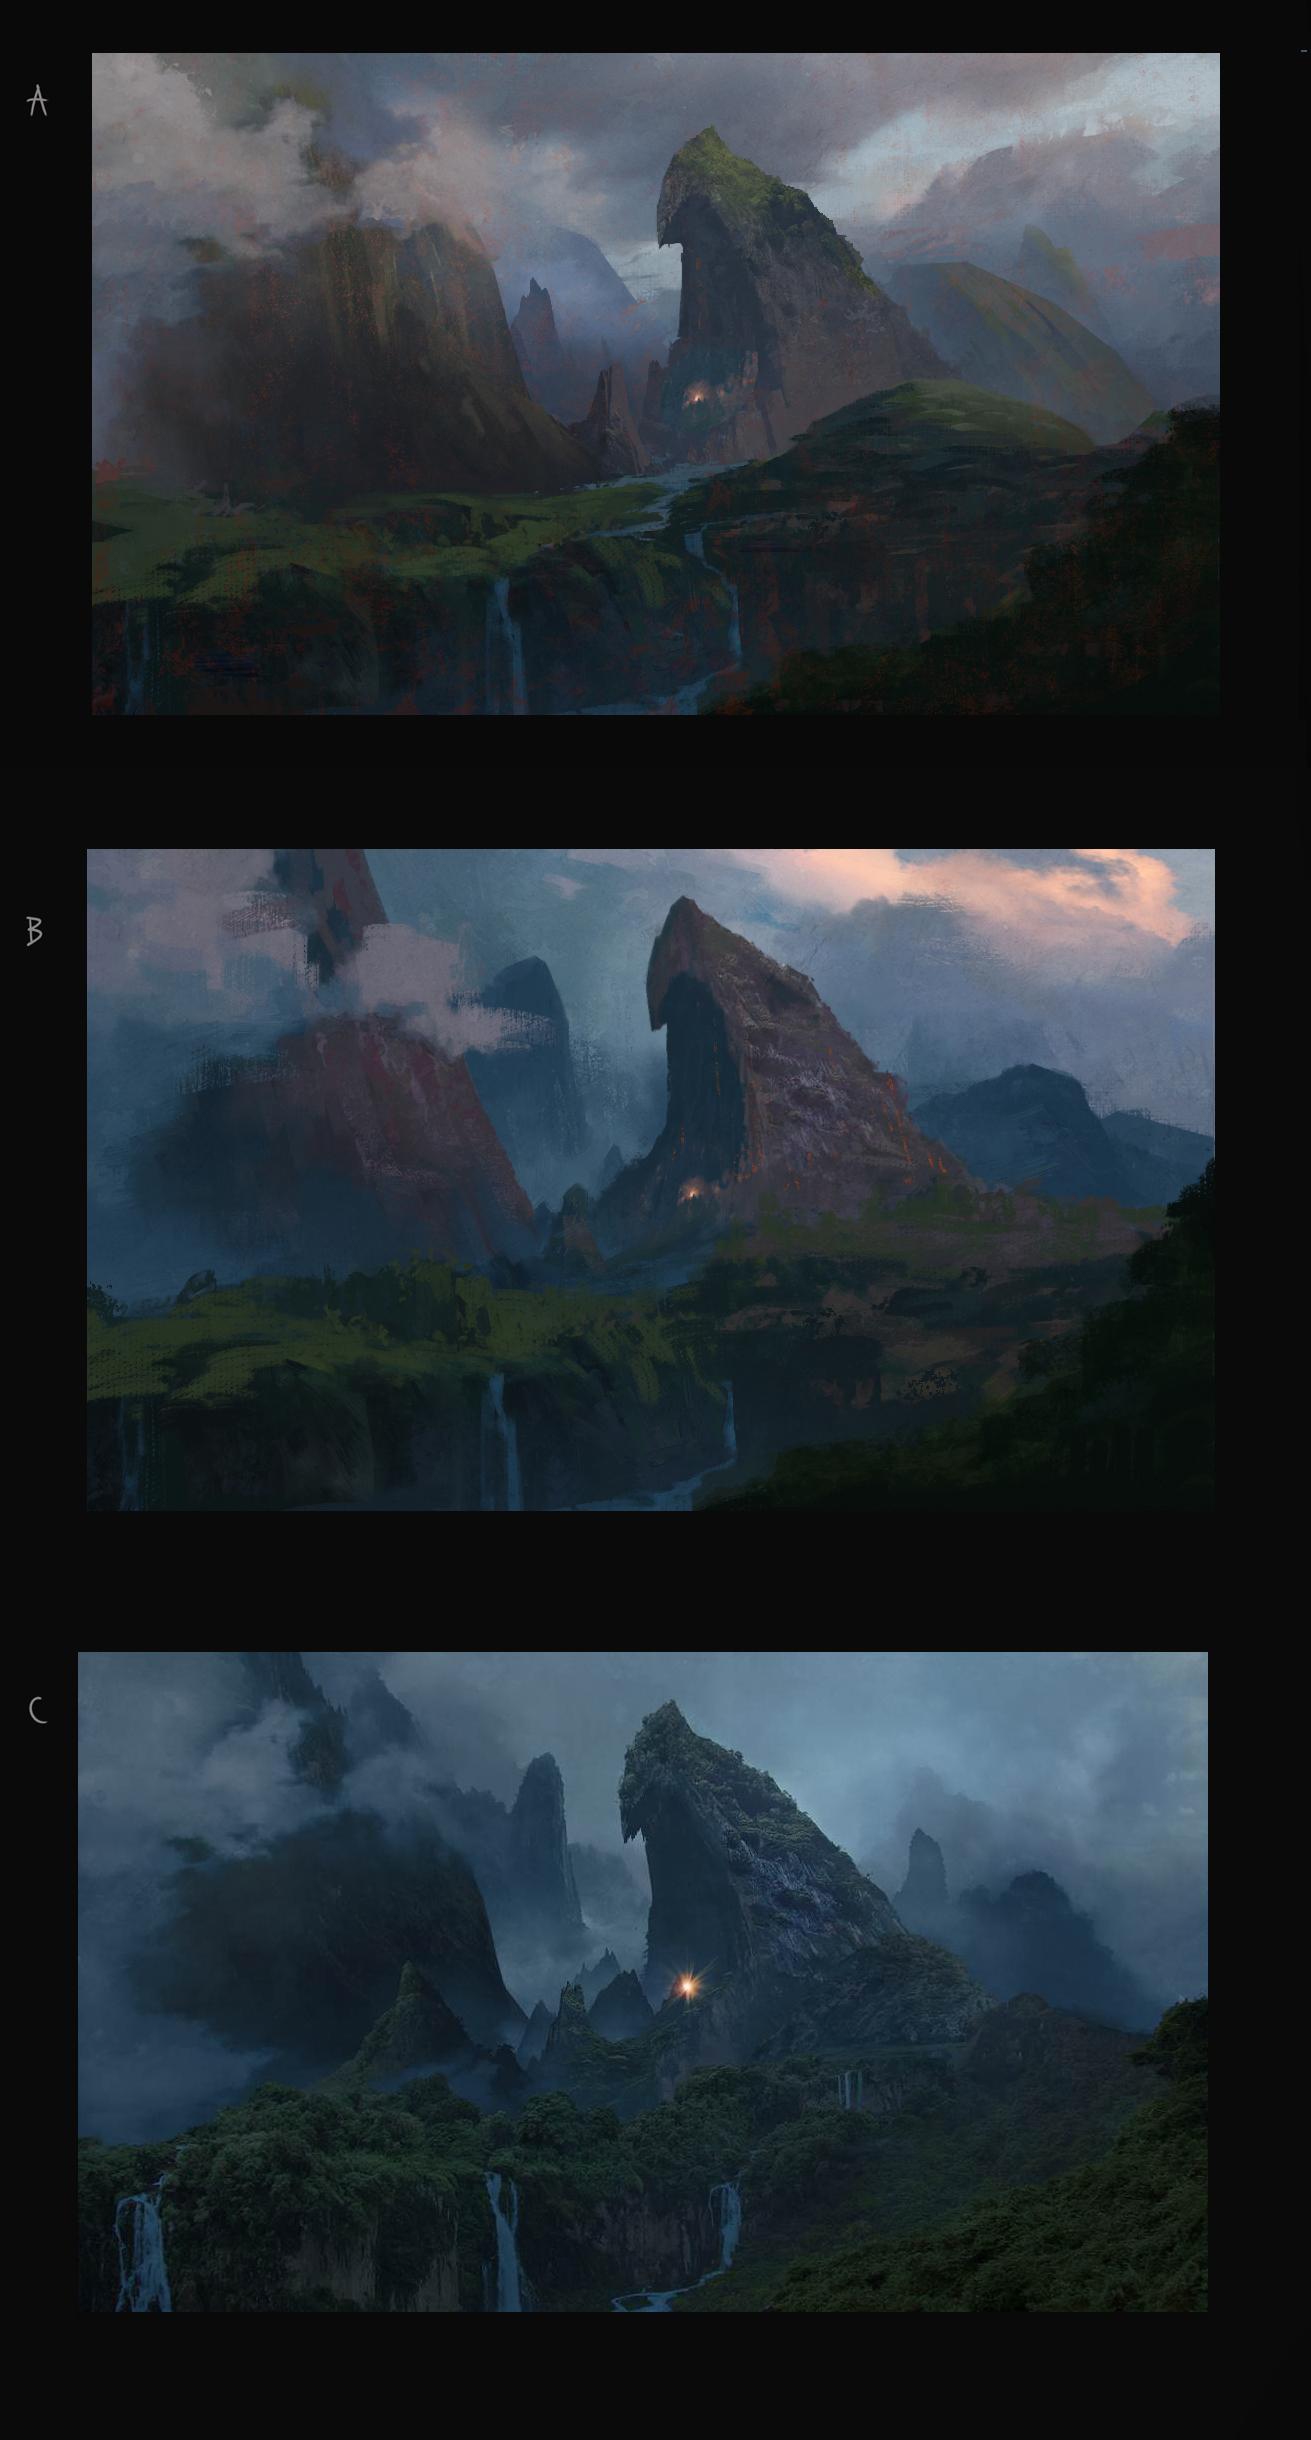 101023_TGEvXaG5uy_u4_concept_mountain_di